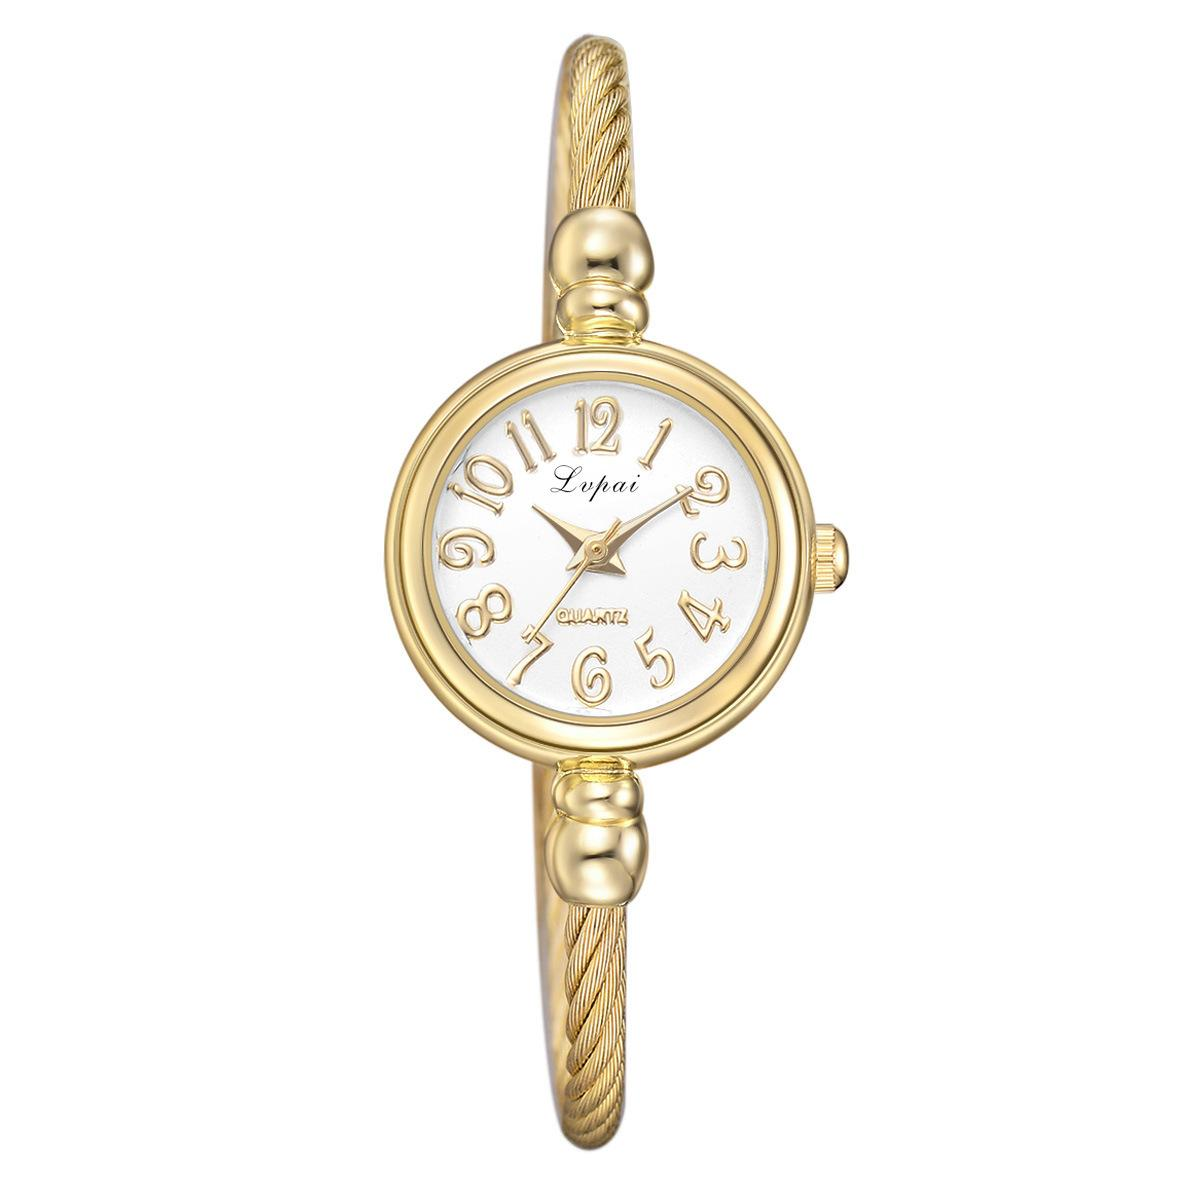 Arte Y Antigüedades Movimiento De Reloj Antiguo The Latest Fashion